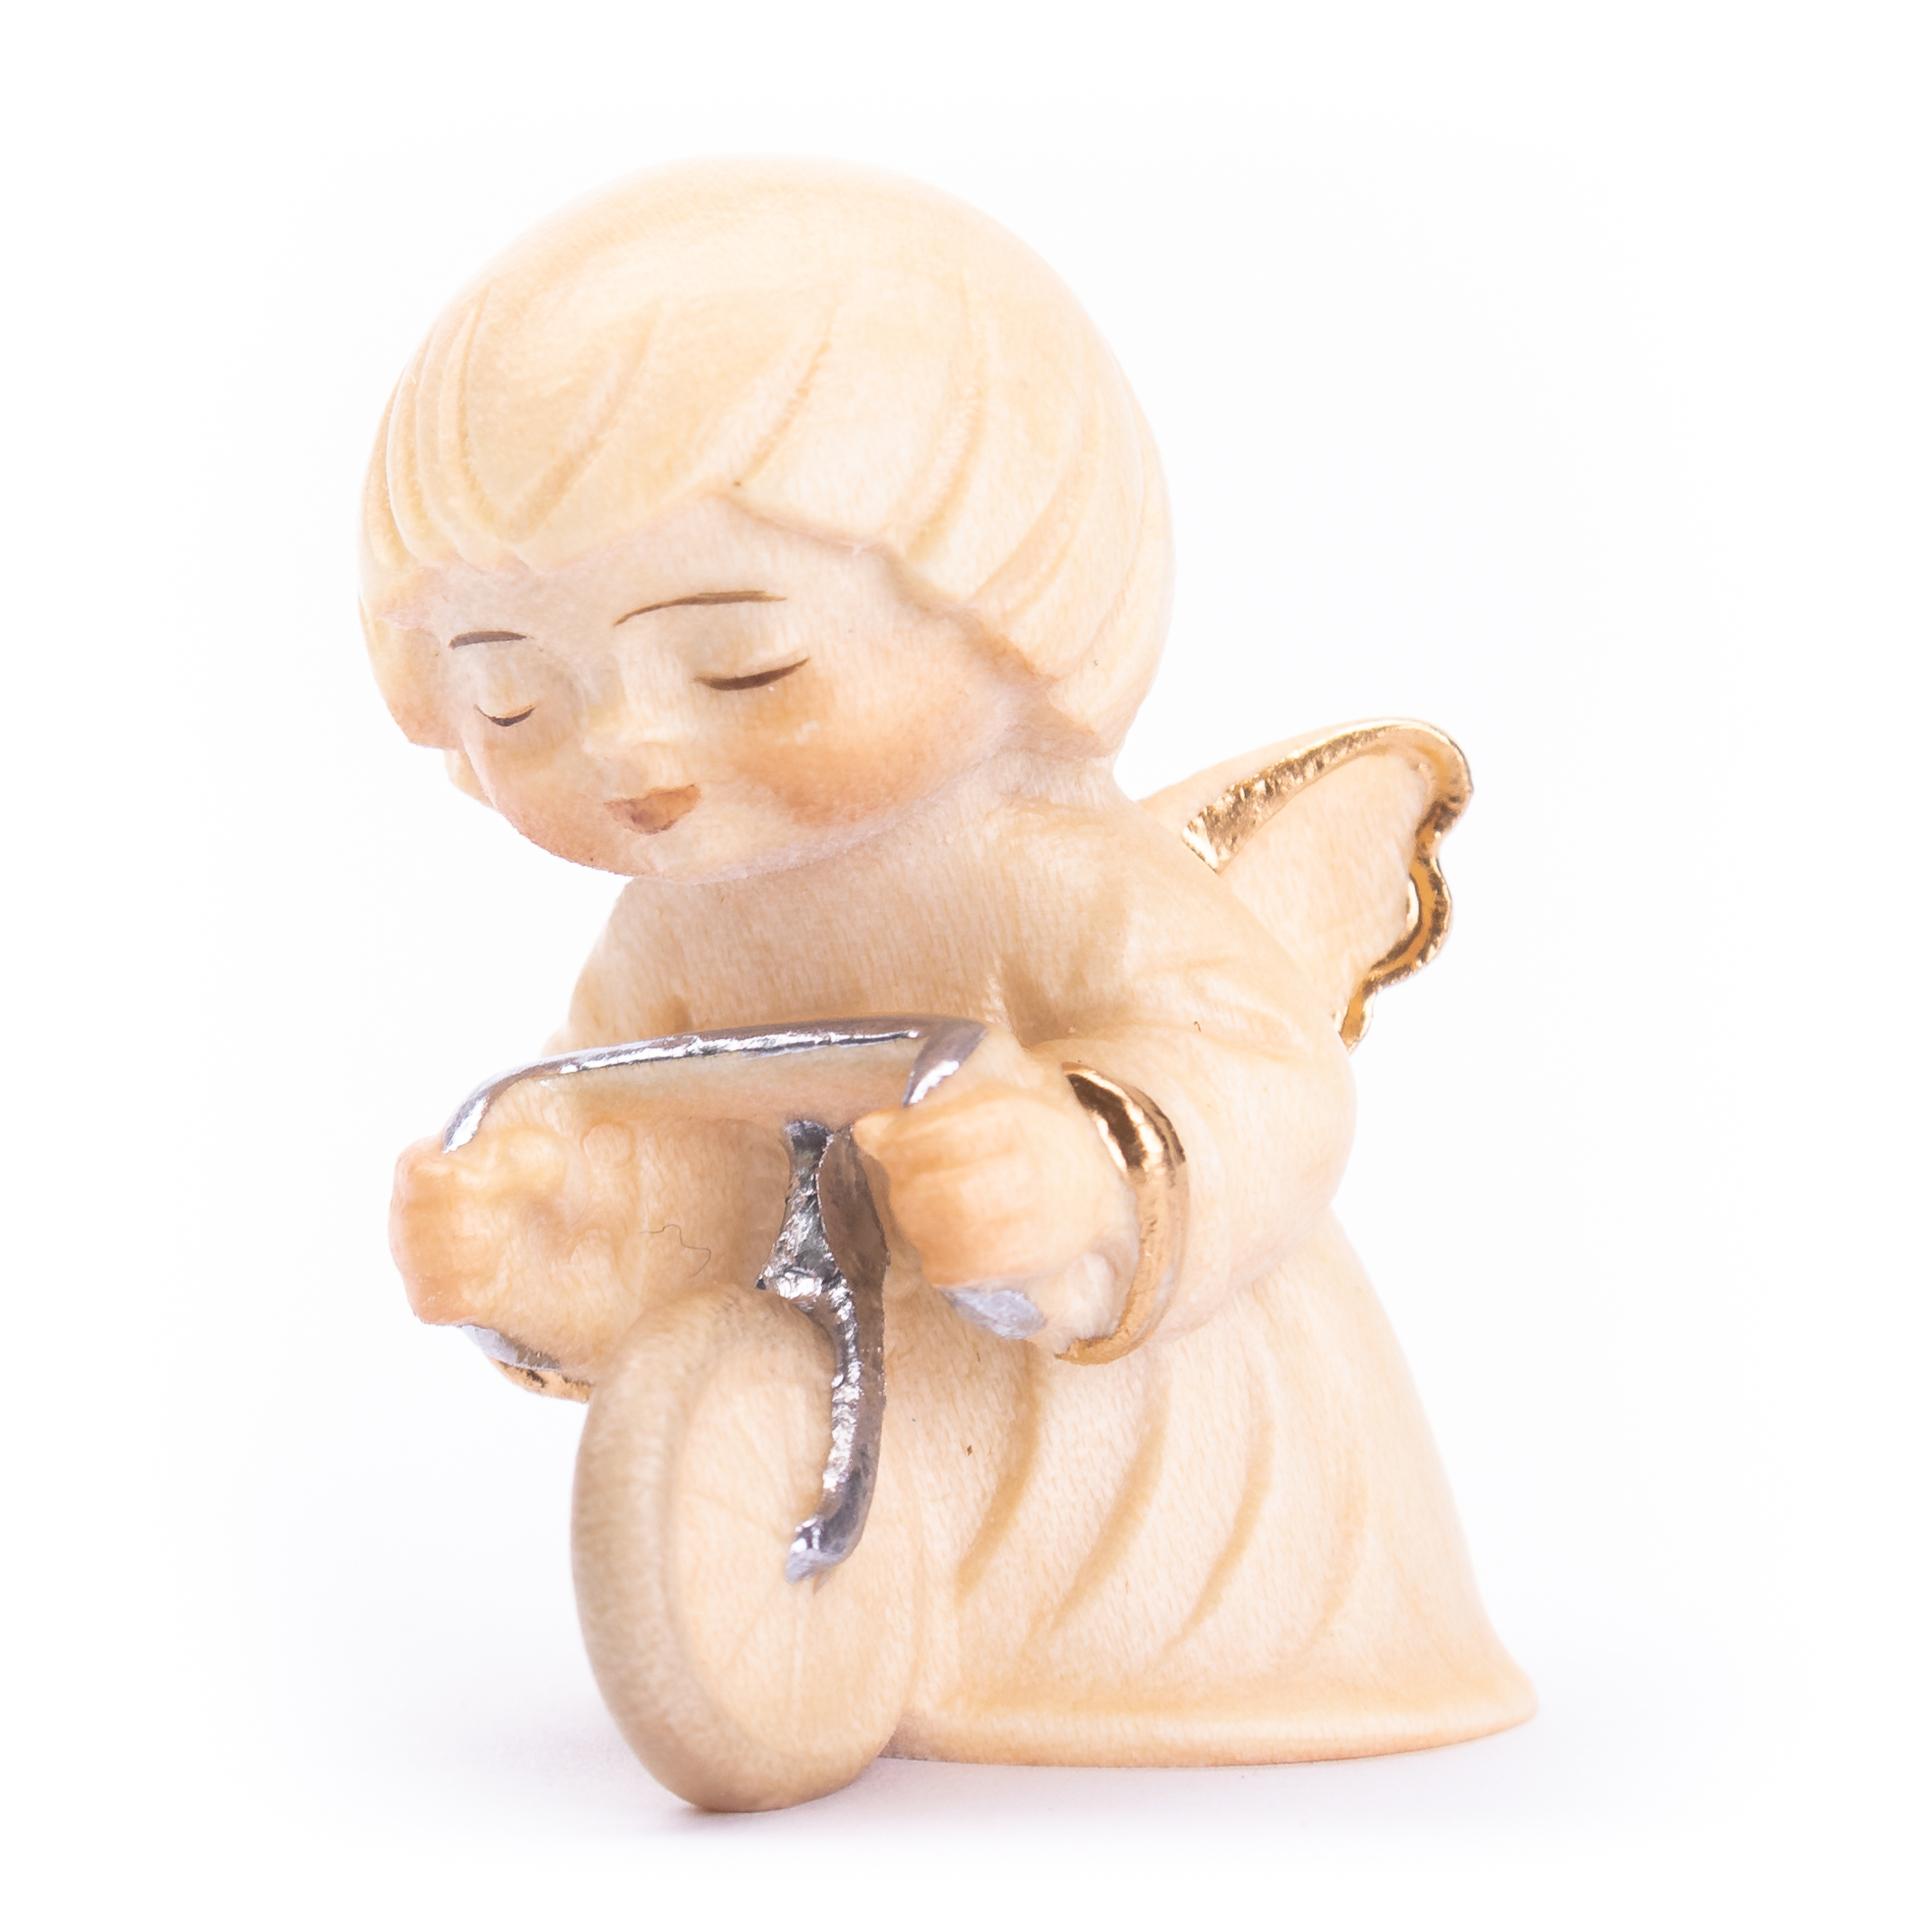 Engel mit Fahrrad, alabaster